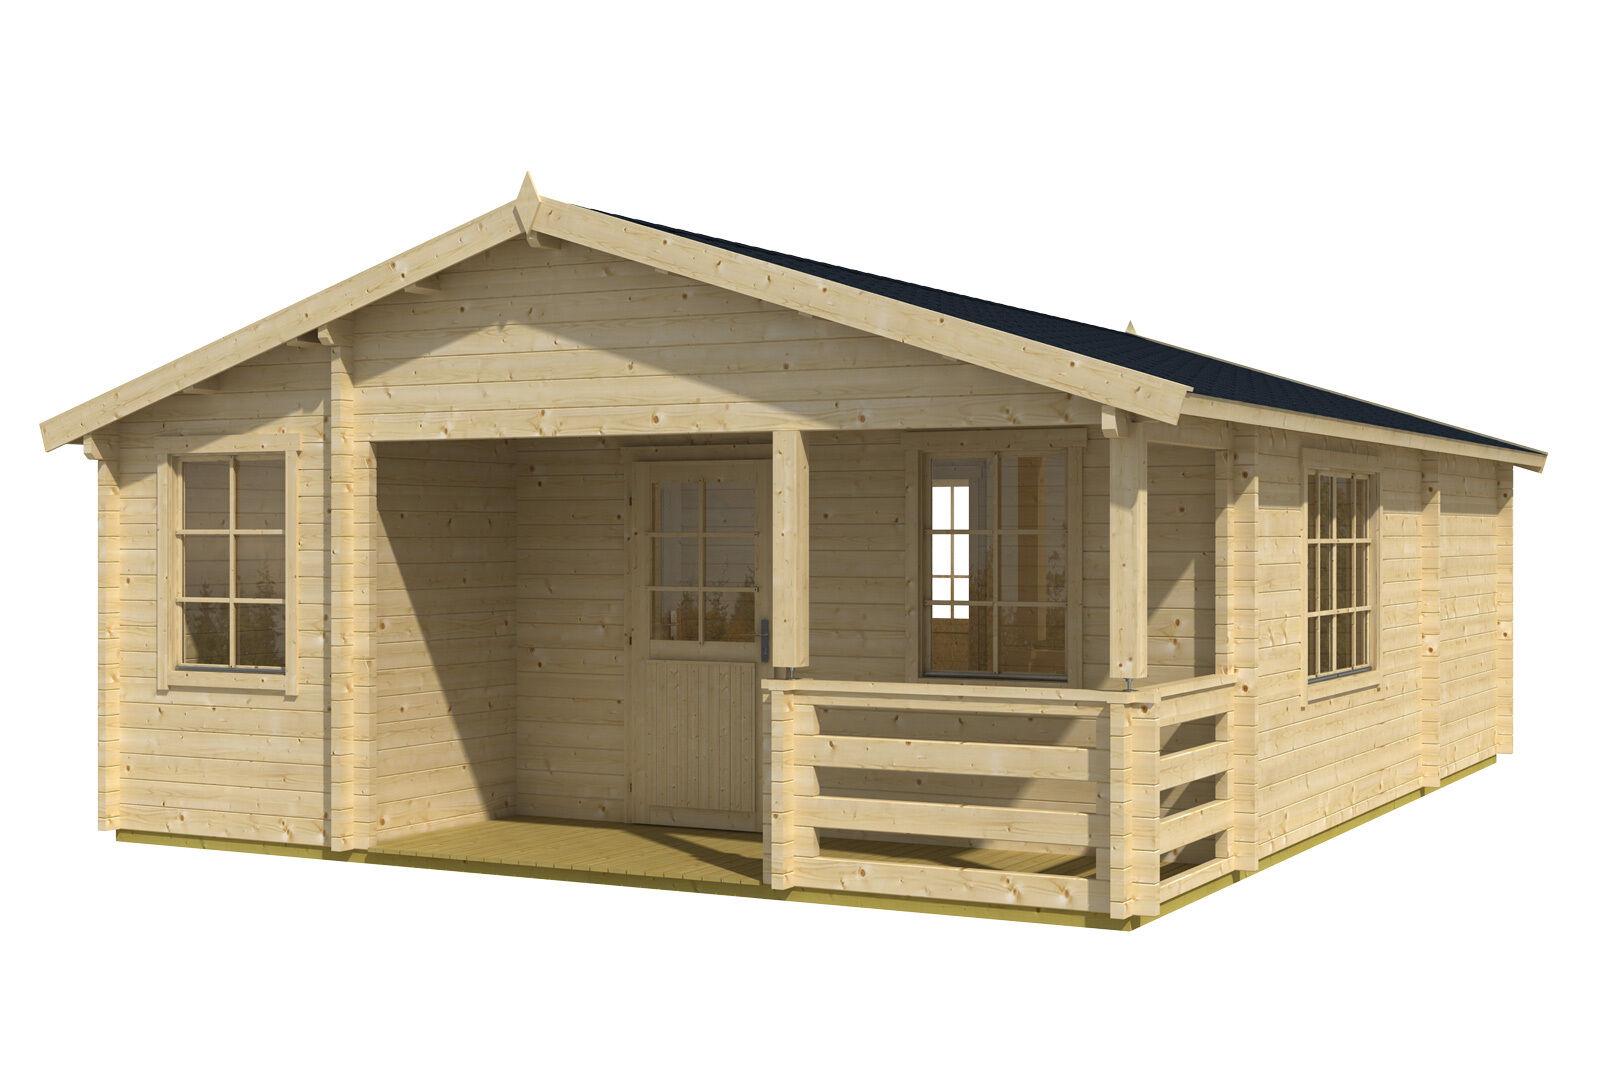 70 mm ferienhaus 595x795 cm terrasse gartenhaus blockhaus holzhaus holz neu ebay. Black Bedroom Furniture Sets. Home Design Ideas